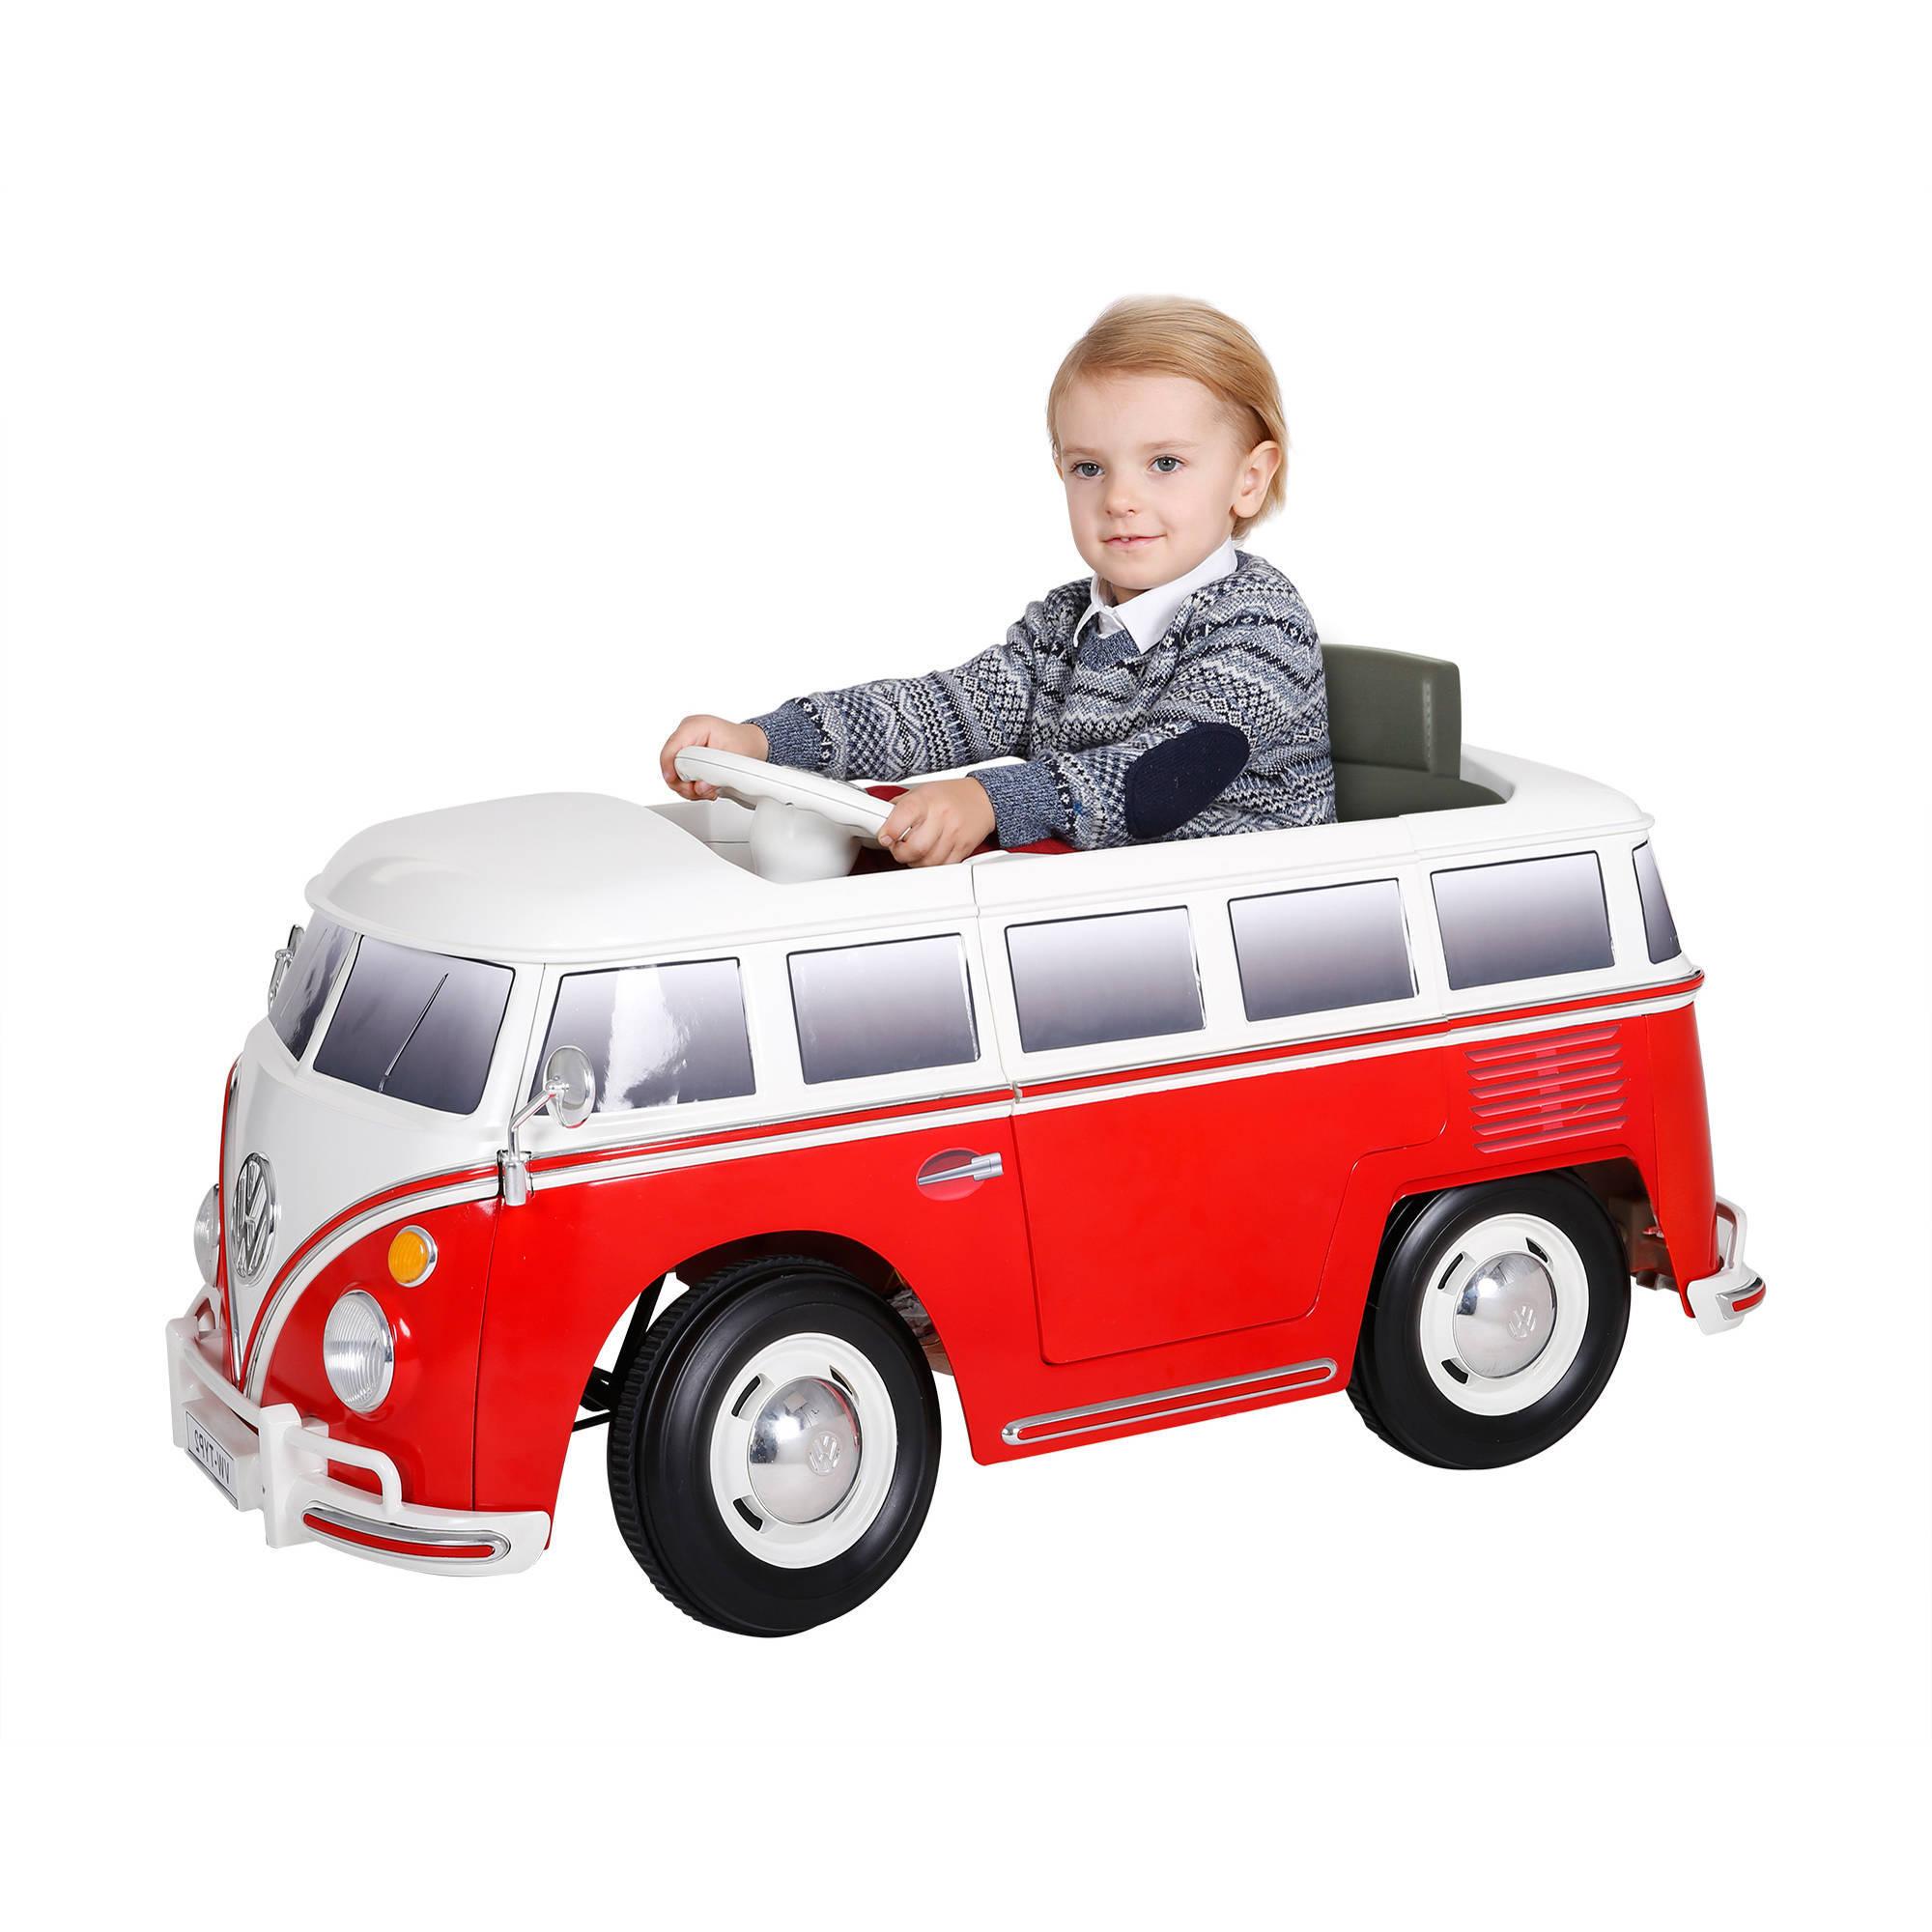 RollPlay 6V VW Bus Battery Powered Ride-On - Walmart.com